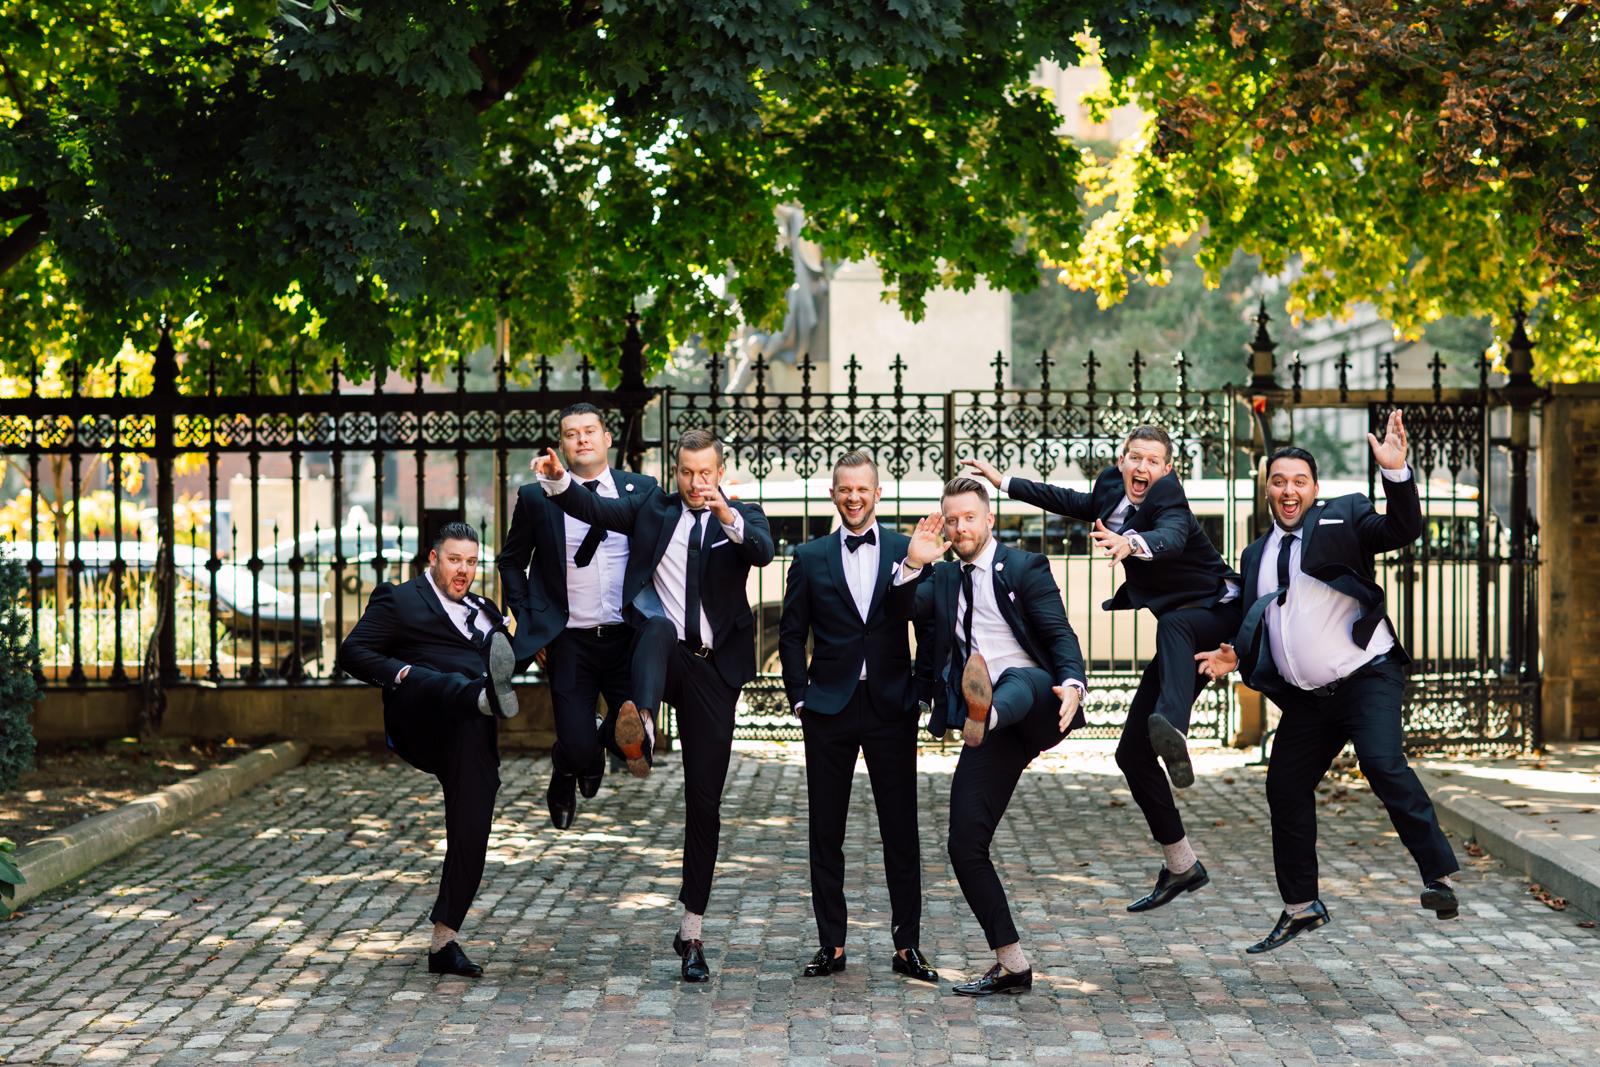 GOTSTYLE groomsmen